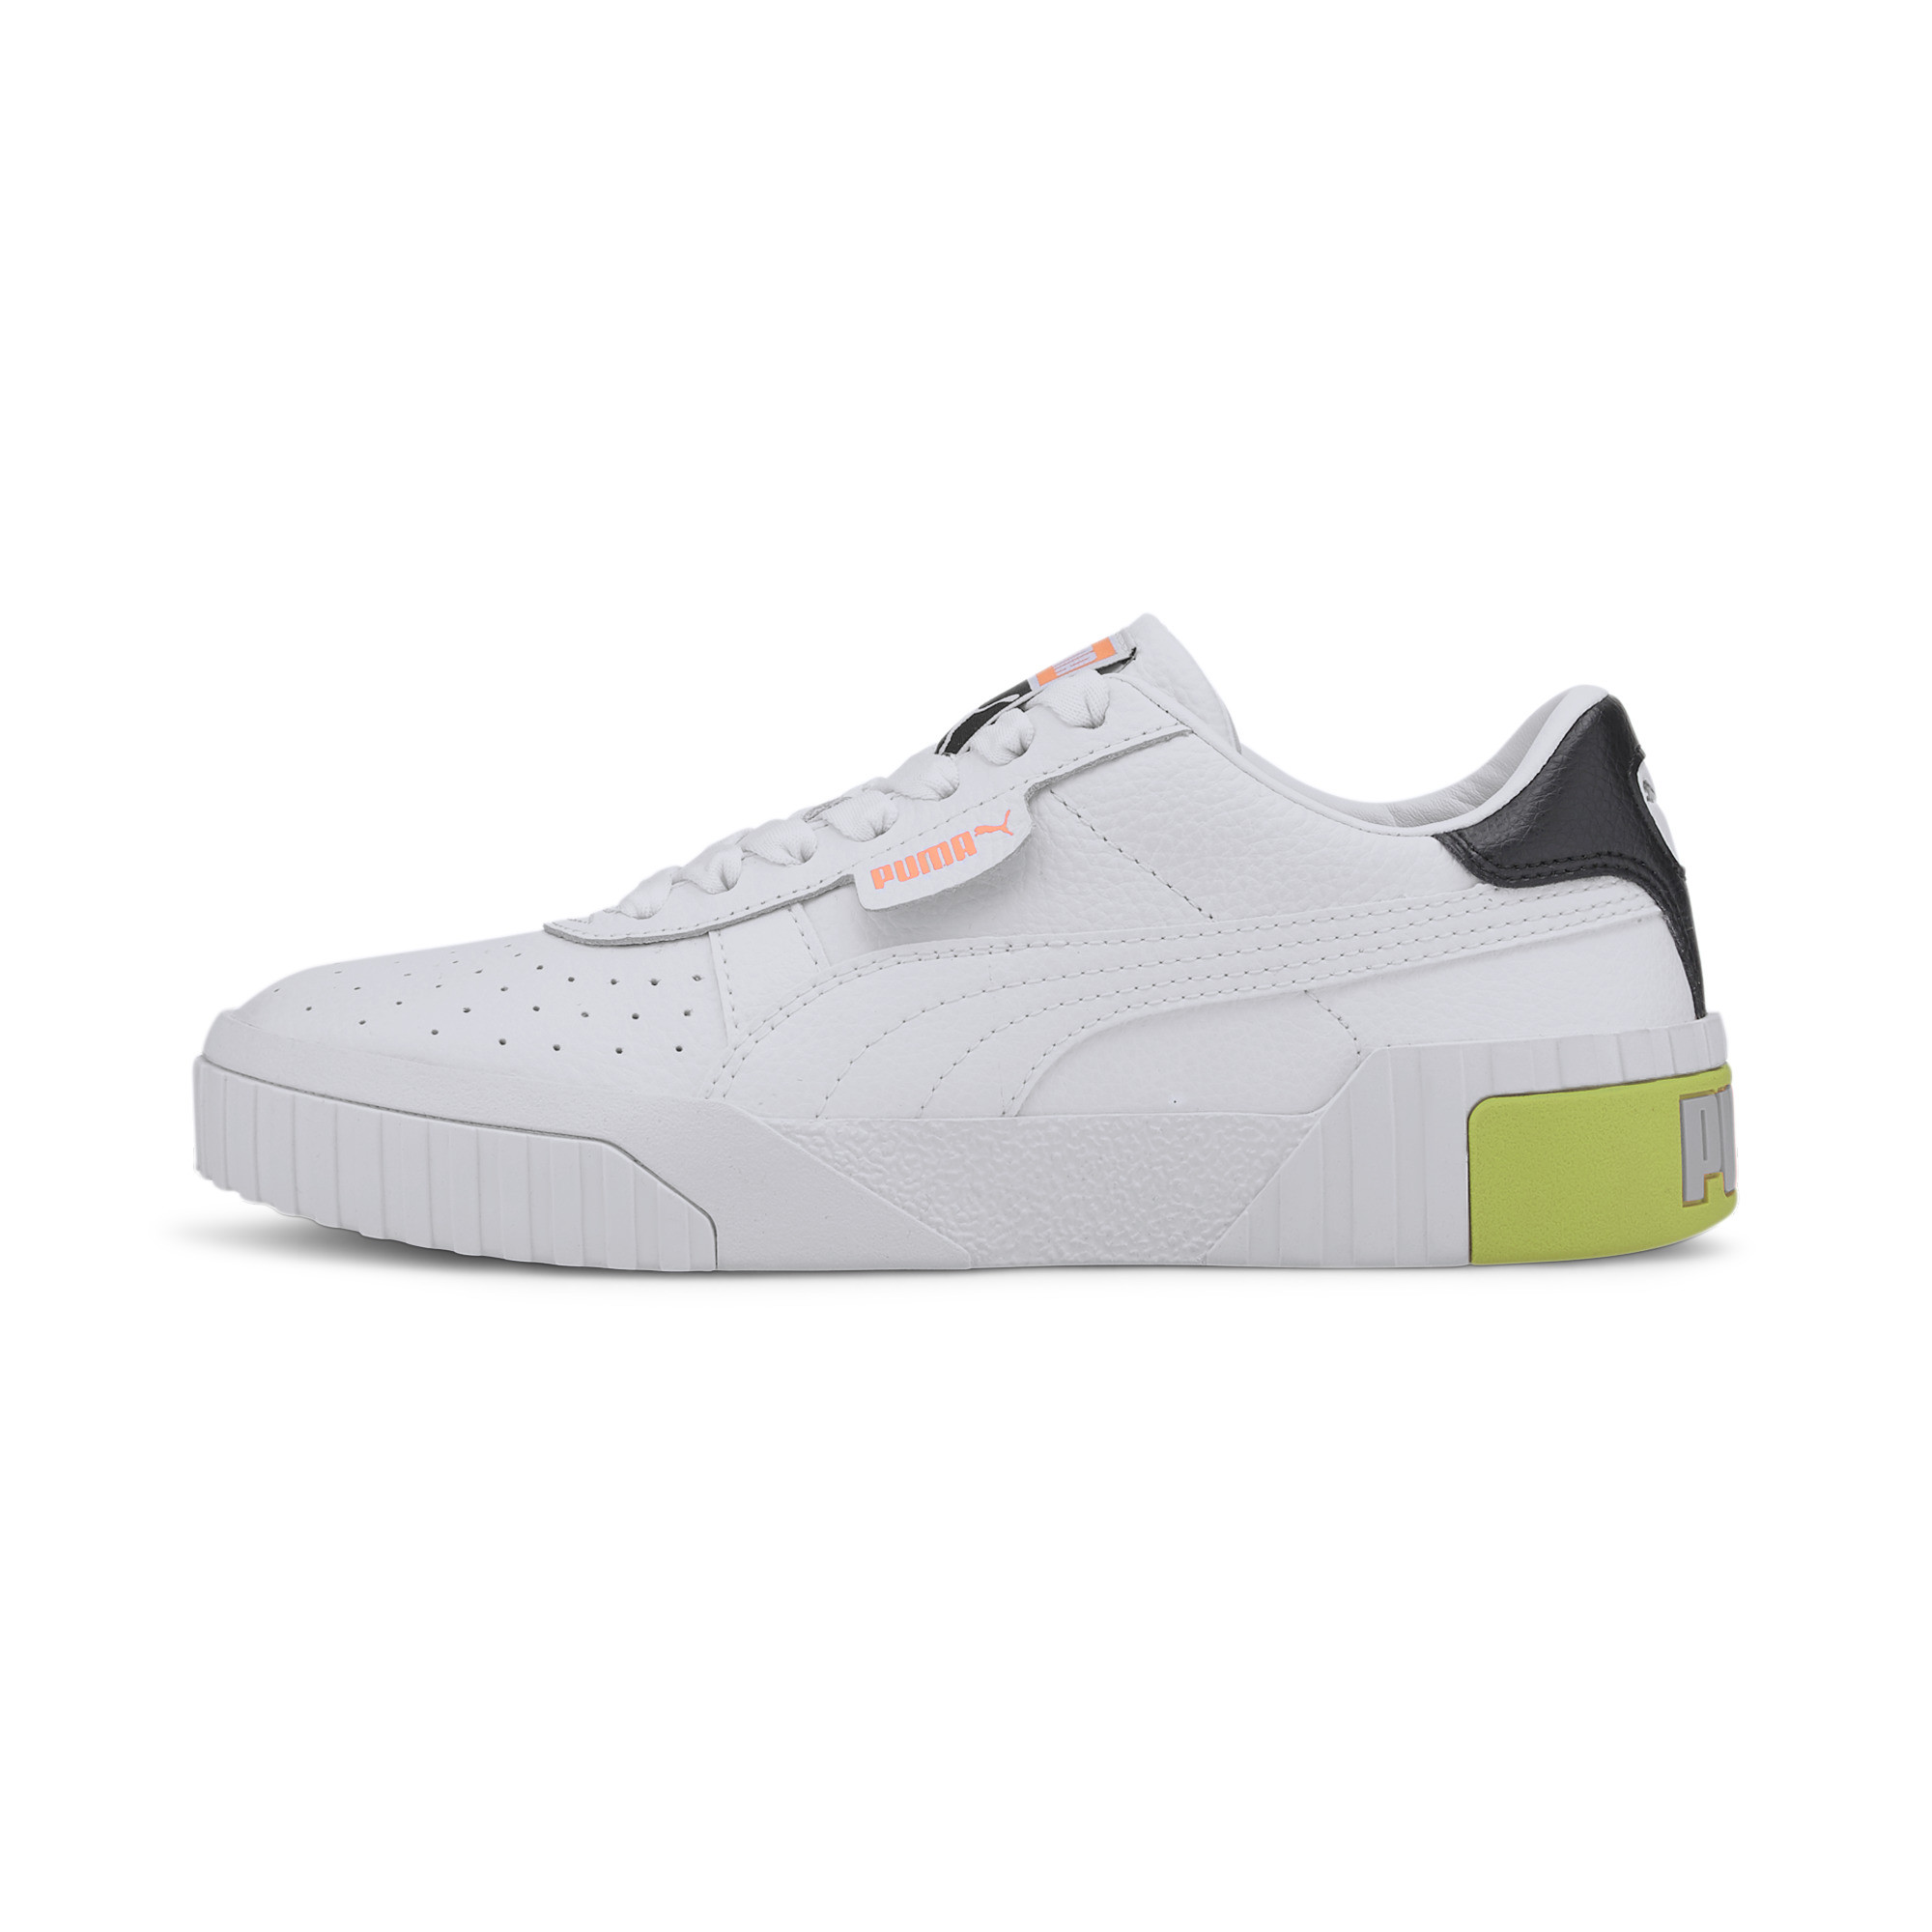 PUMA-Women-039-s-Cali-Sneakers thumbnail 14